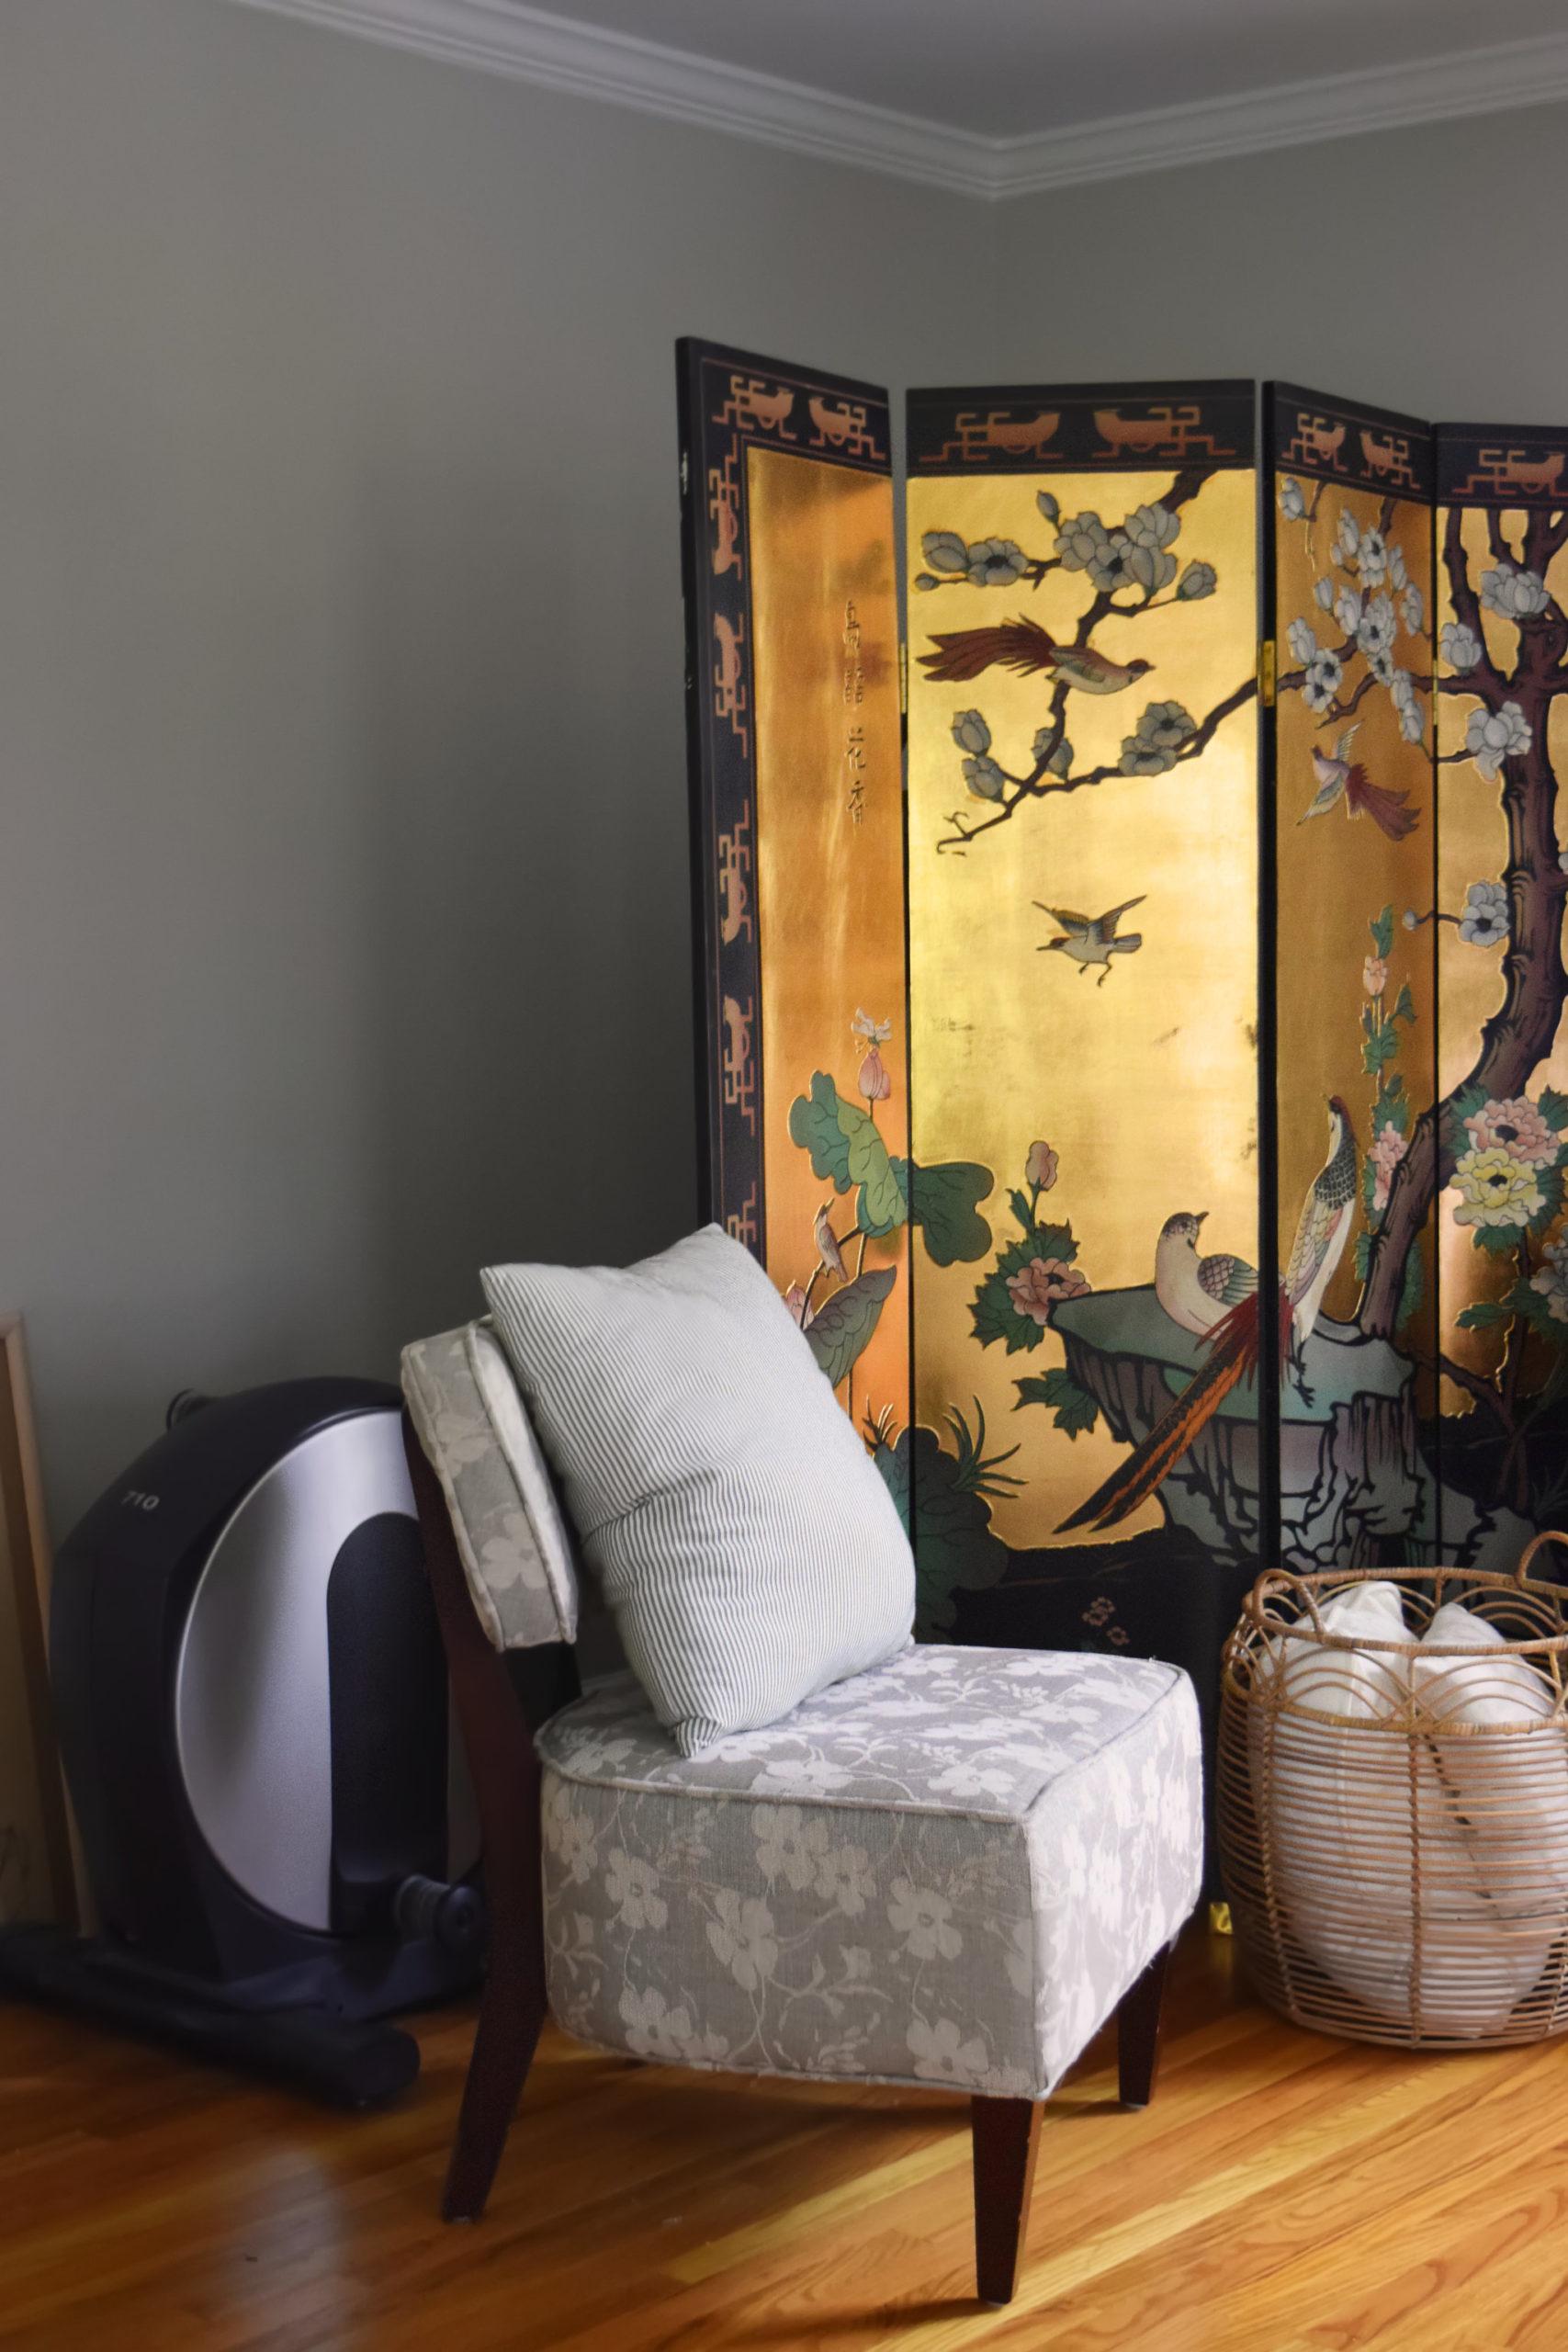 elliptical hiding behind chinoiserie screen